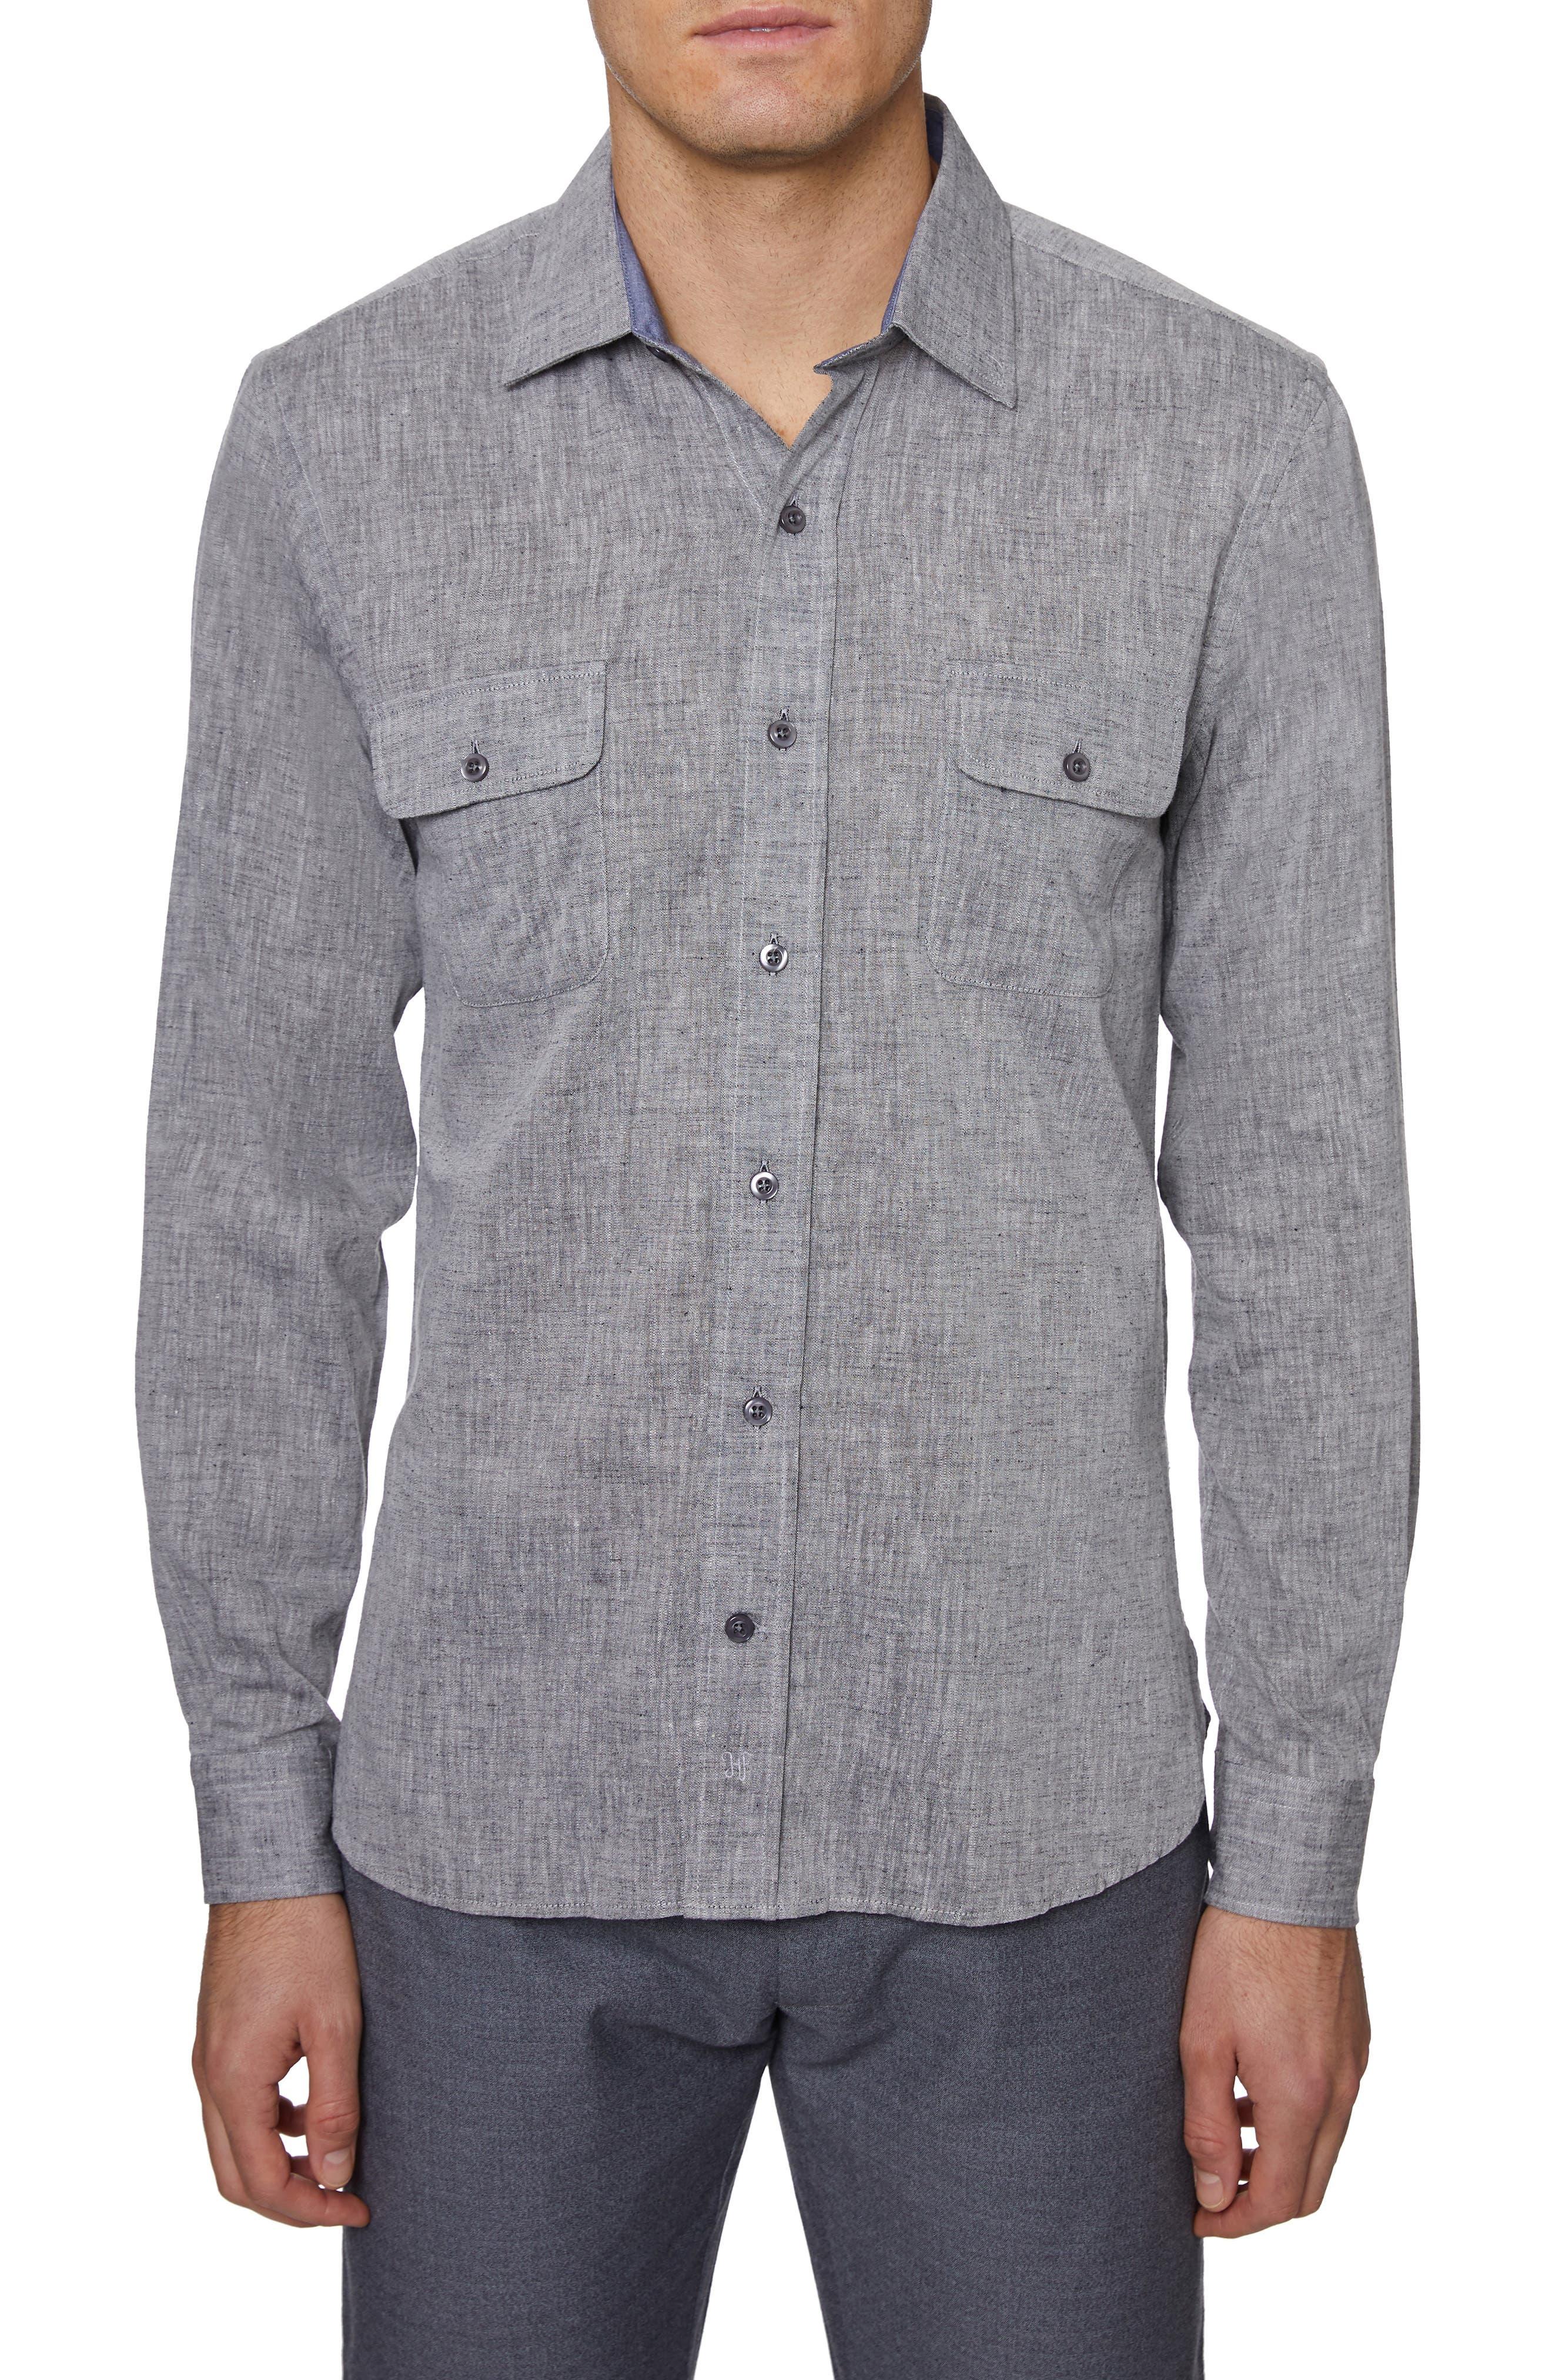 Regular Fit Cotton & Linen Sport Shirt, Main, color, GREY